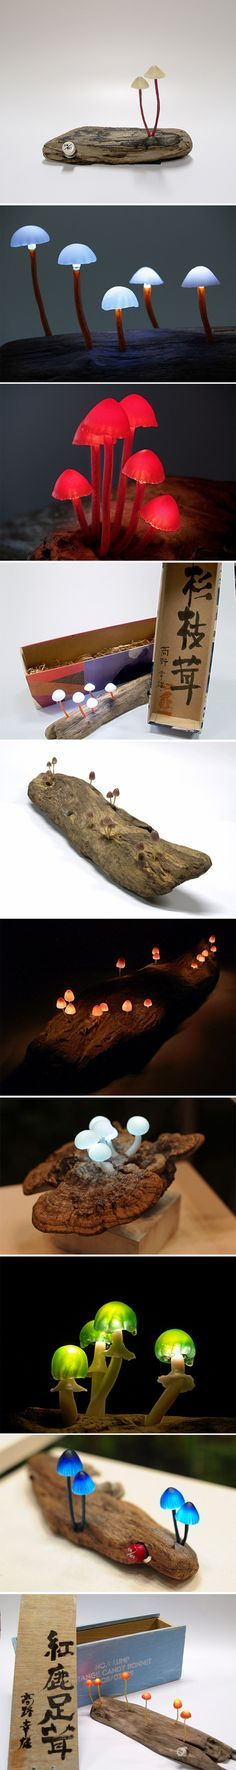 Yukio Takano : LED Mushroom Lights. These are awesome and hilarious, I love them.